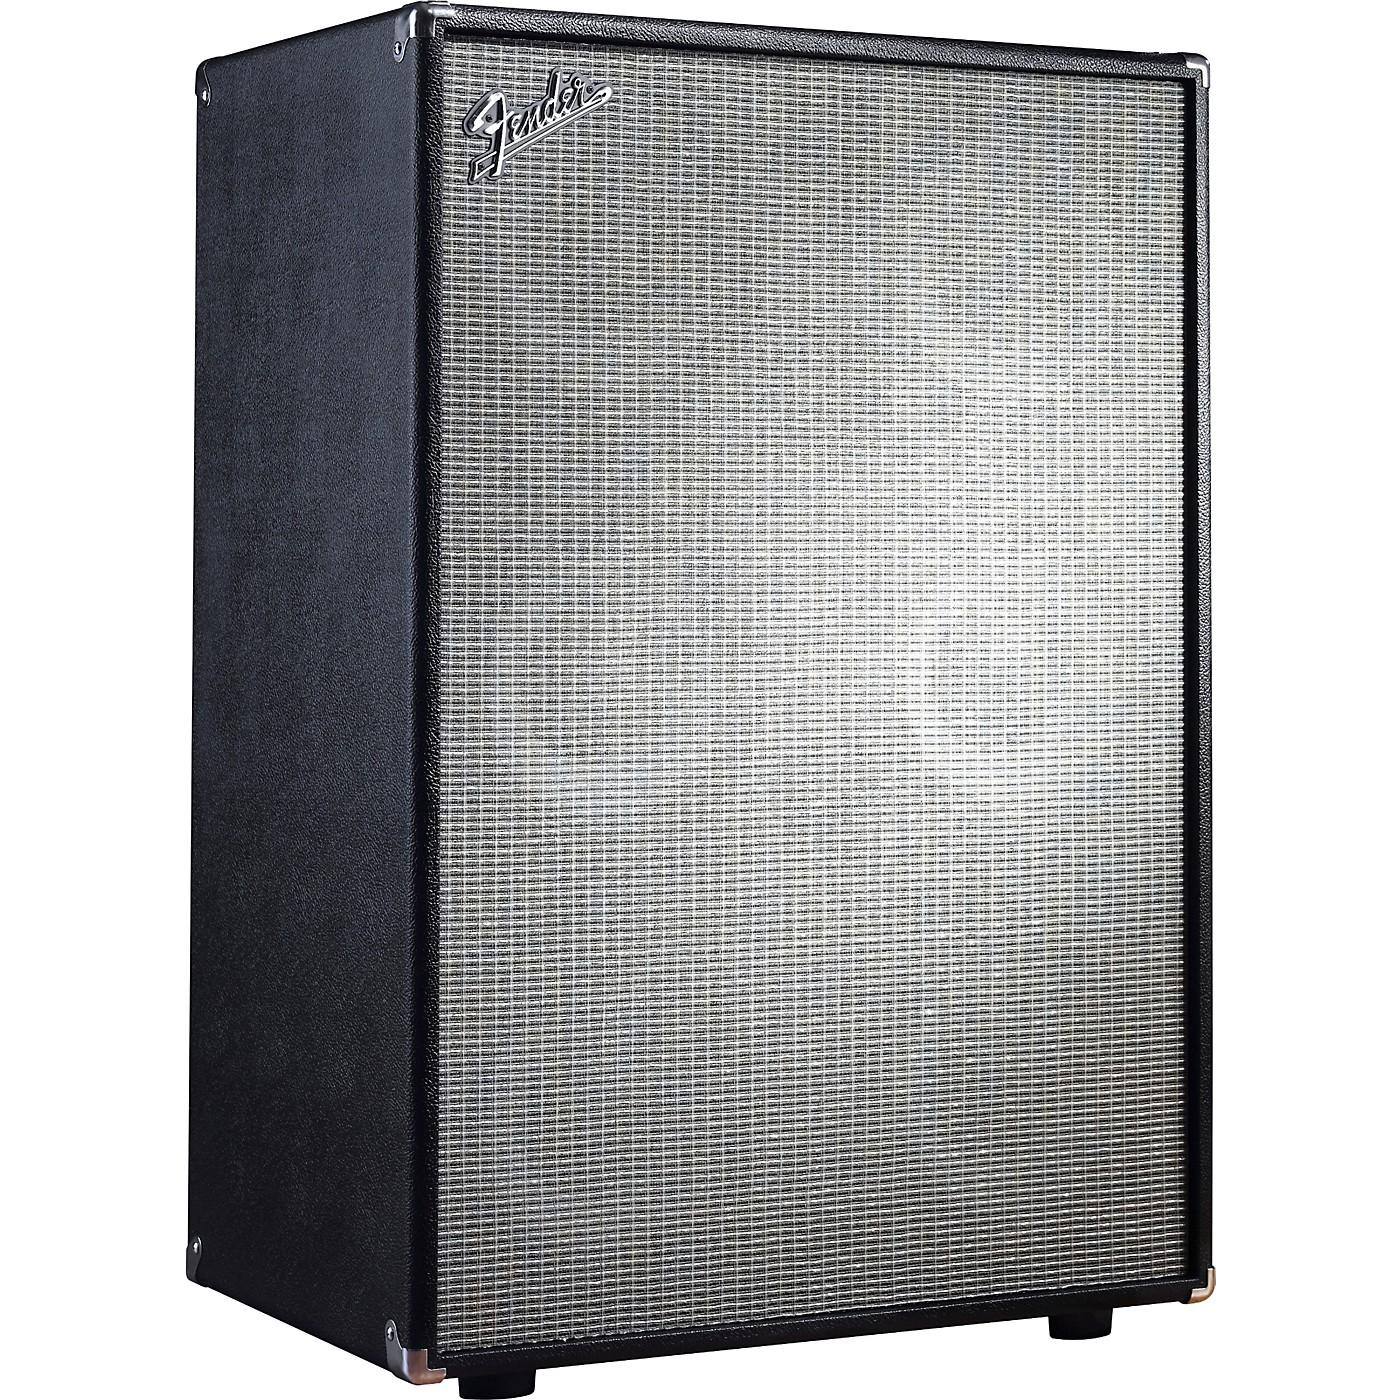 Fender Bassman Pro 610 6x10 Neo Bass Speaker Cabinet thumbnail